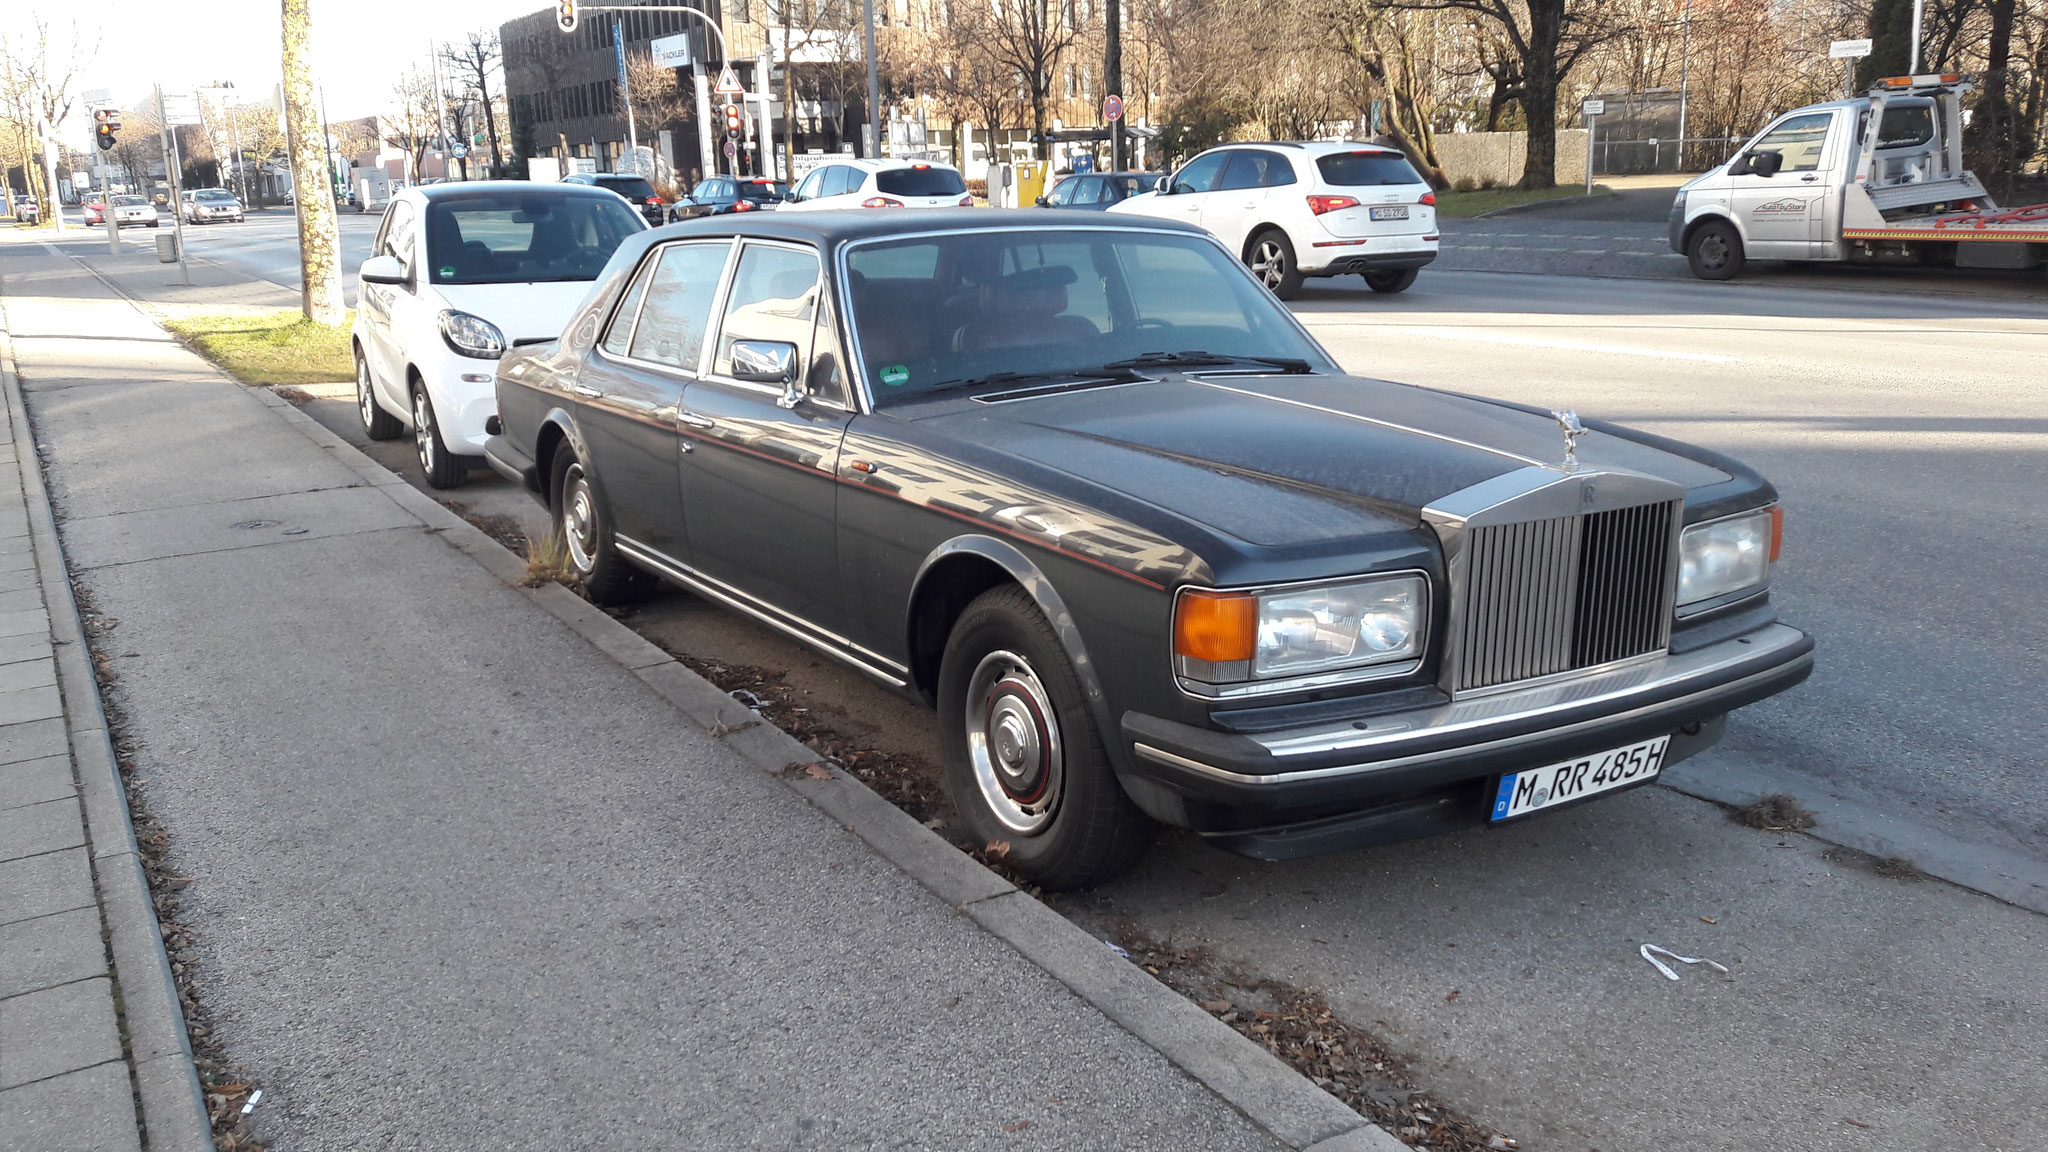 Rolls Royce Silver Spirit - MK1 - M-RR-485H